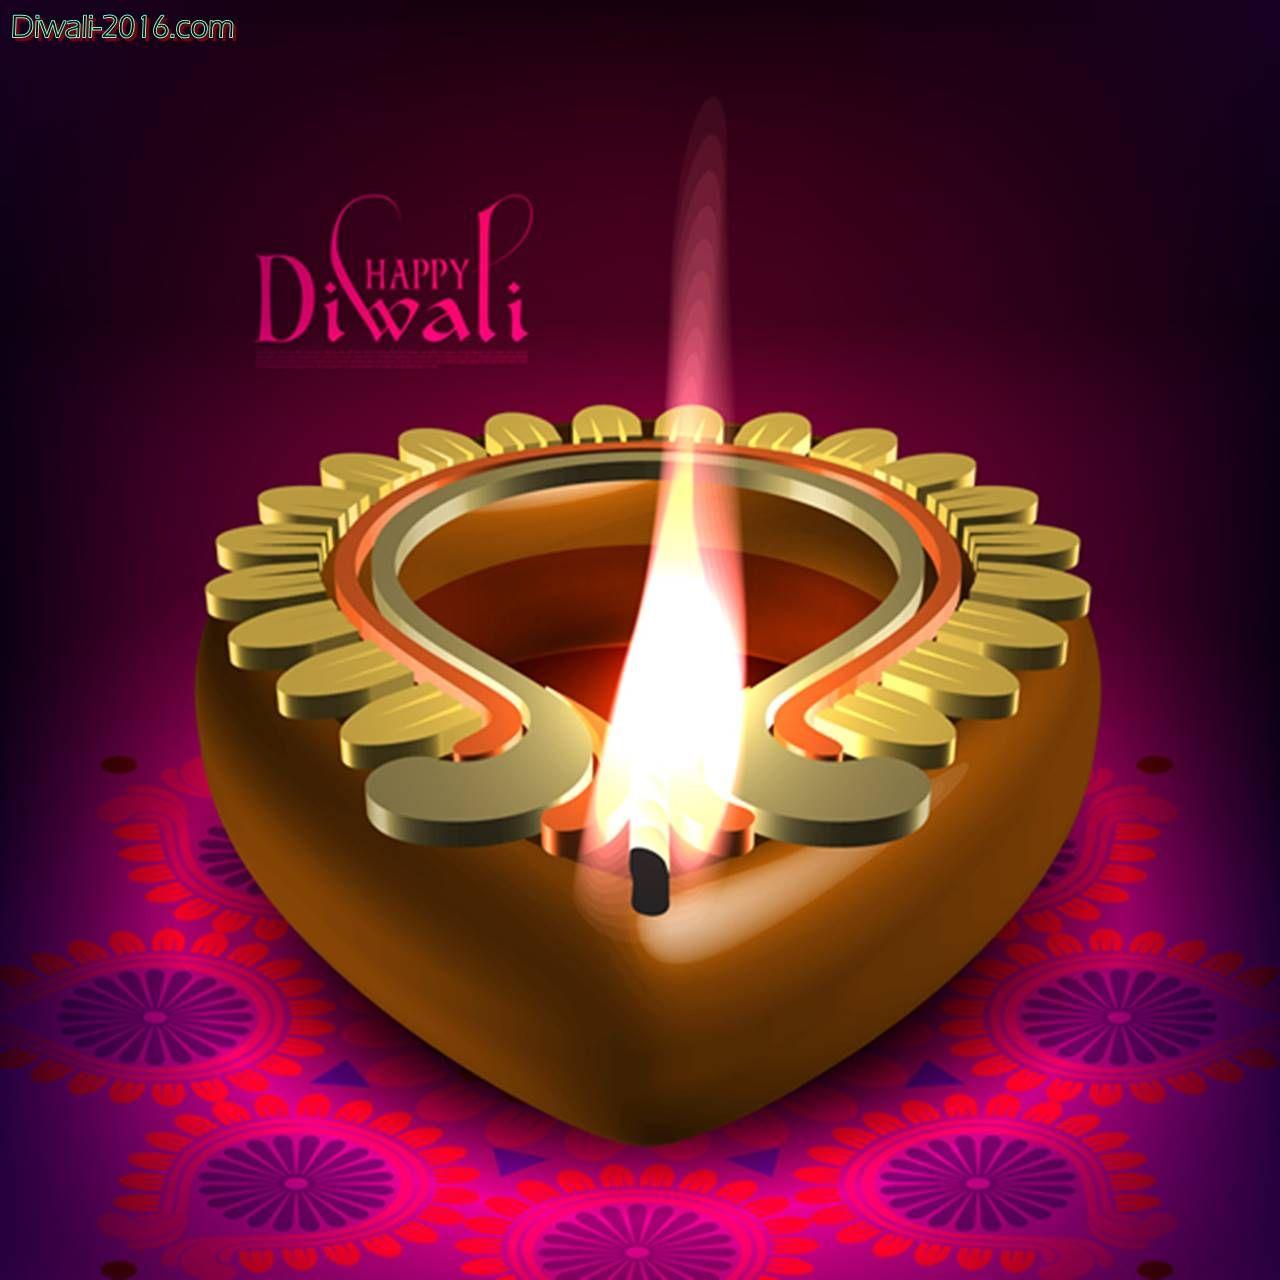 Free Diwali 3d Image Download 31 Top Images Of Happy Diwali